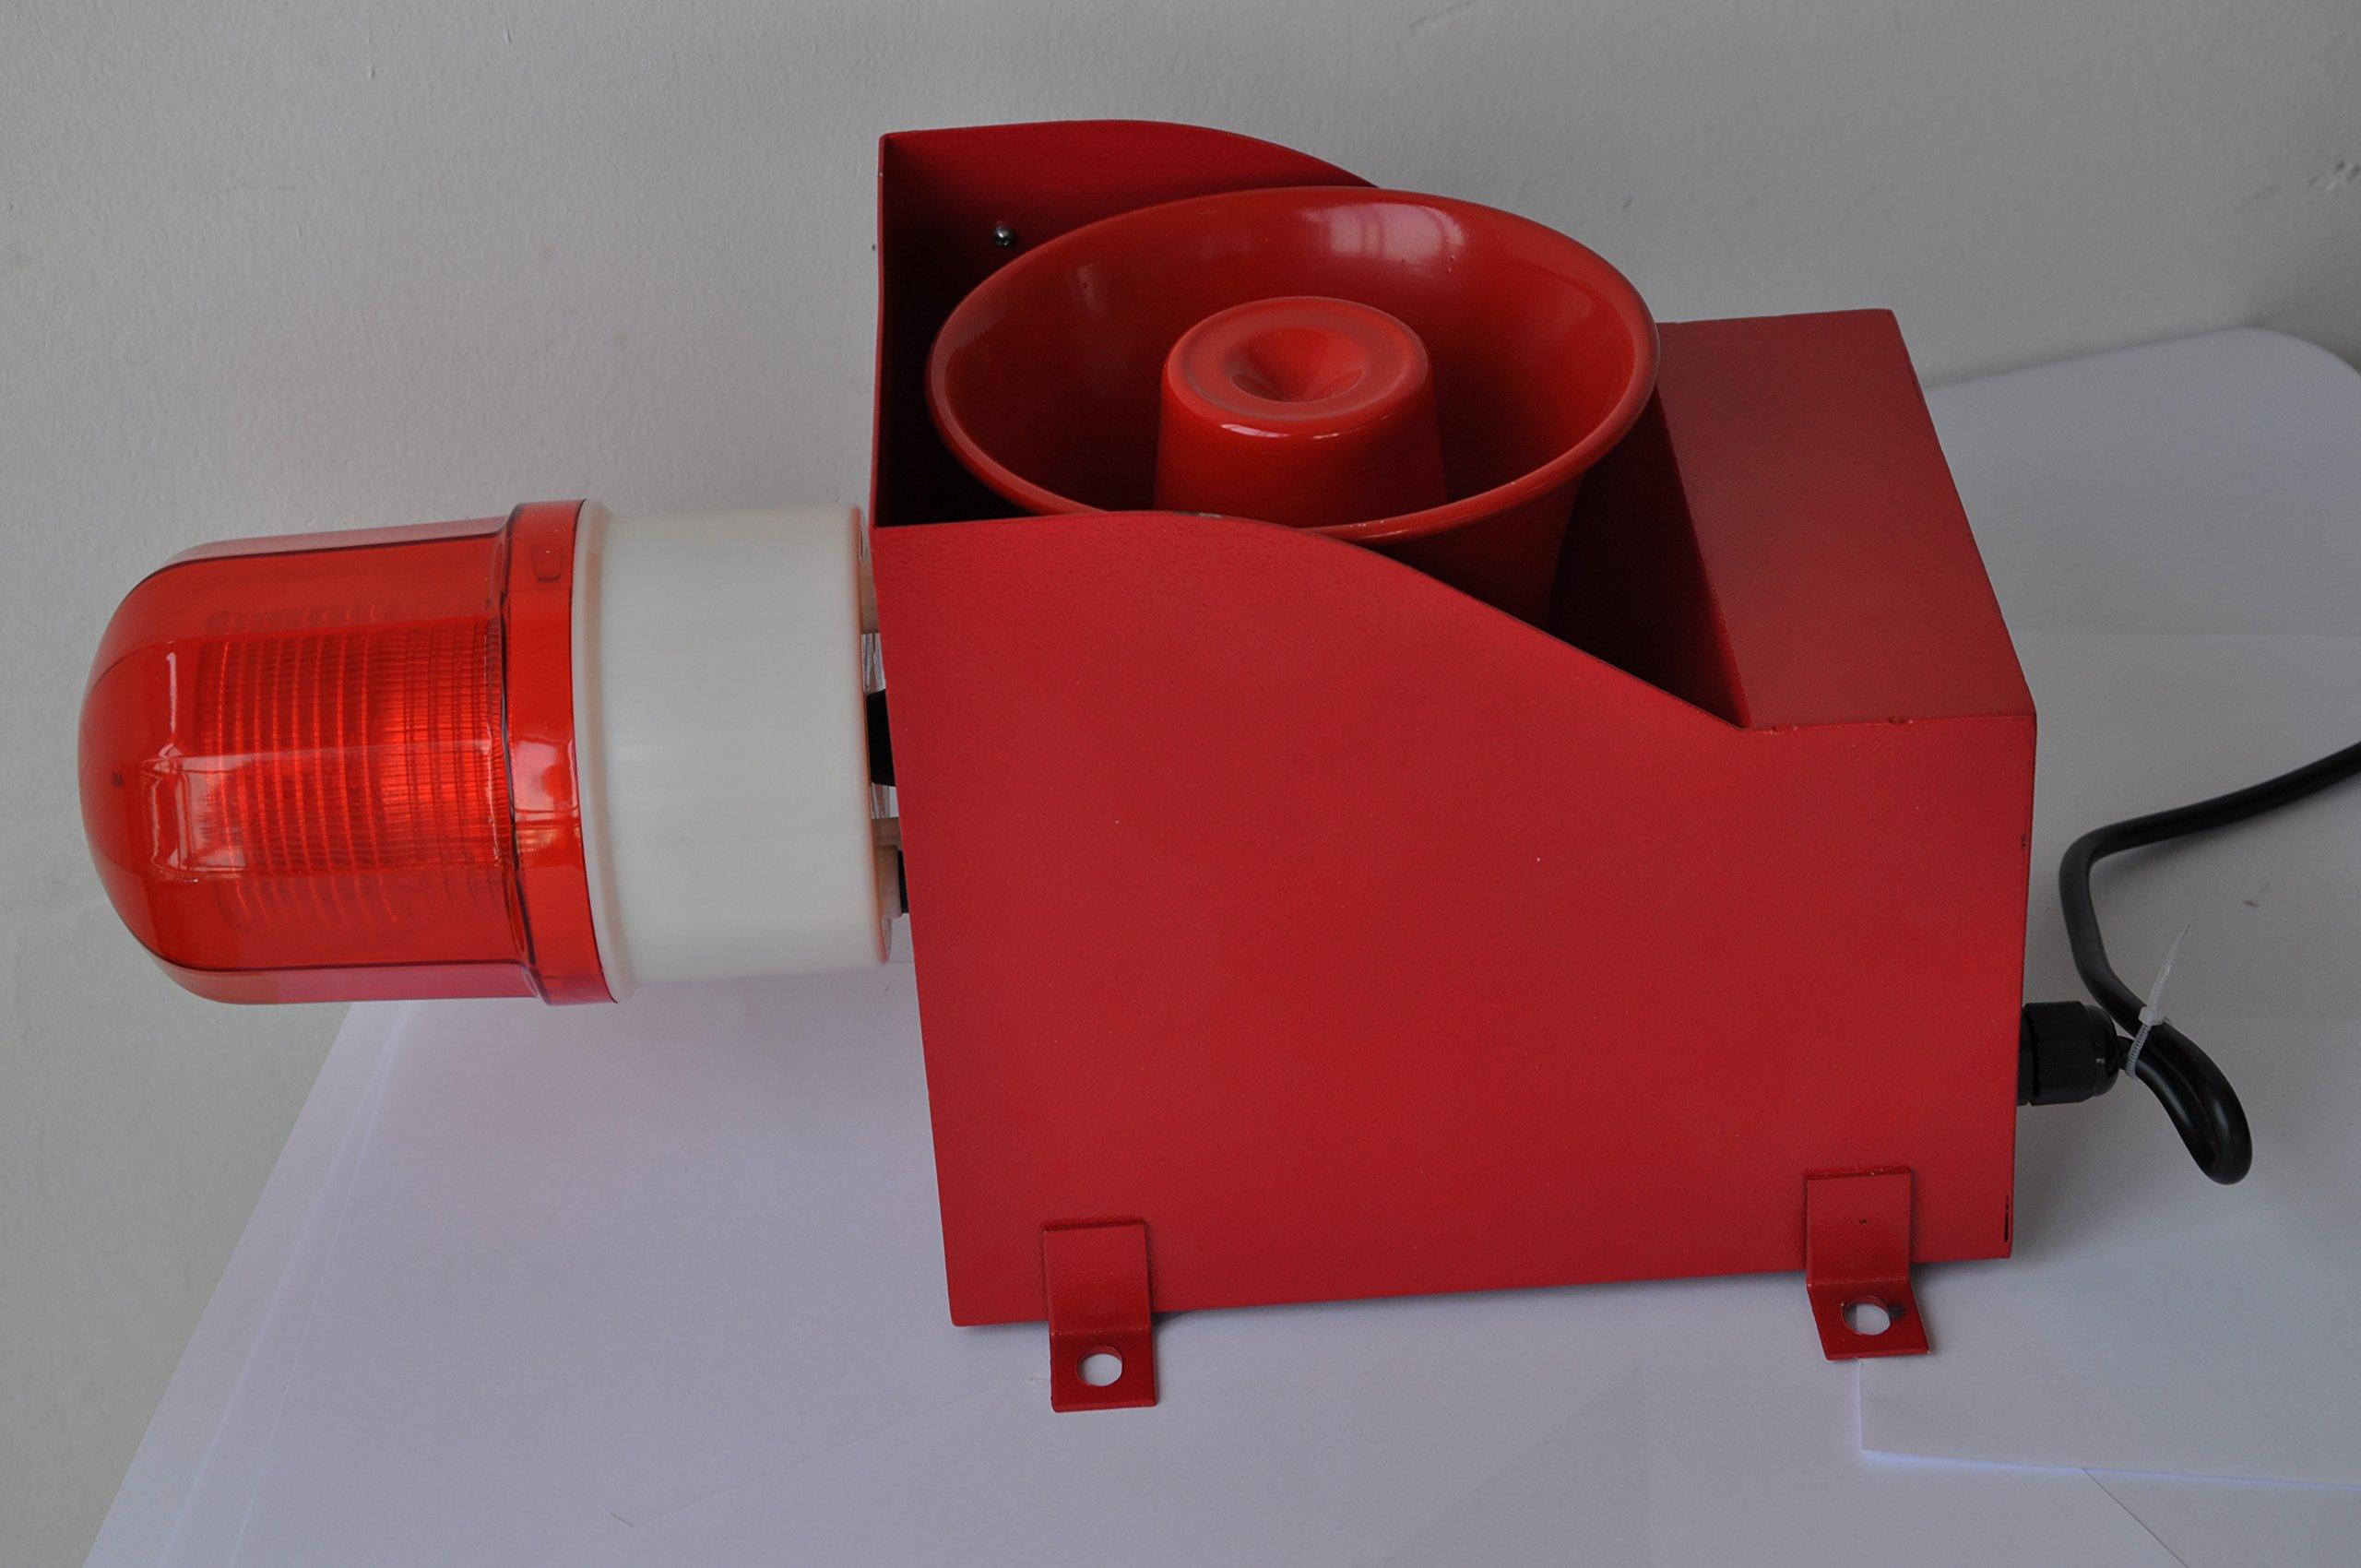 YS-05A Flashing Light Siren Alarm with Fire Alarm Sounds - Manufacturer AC220V-240V